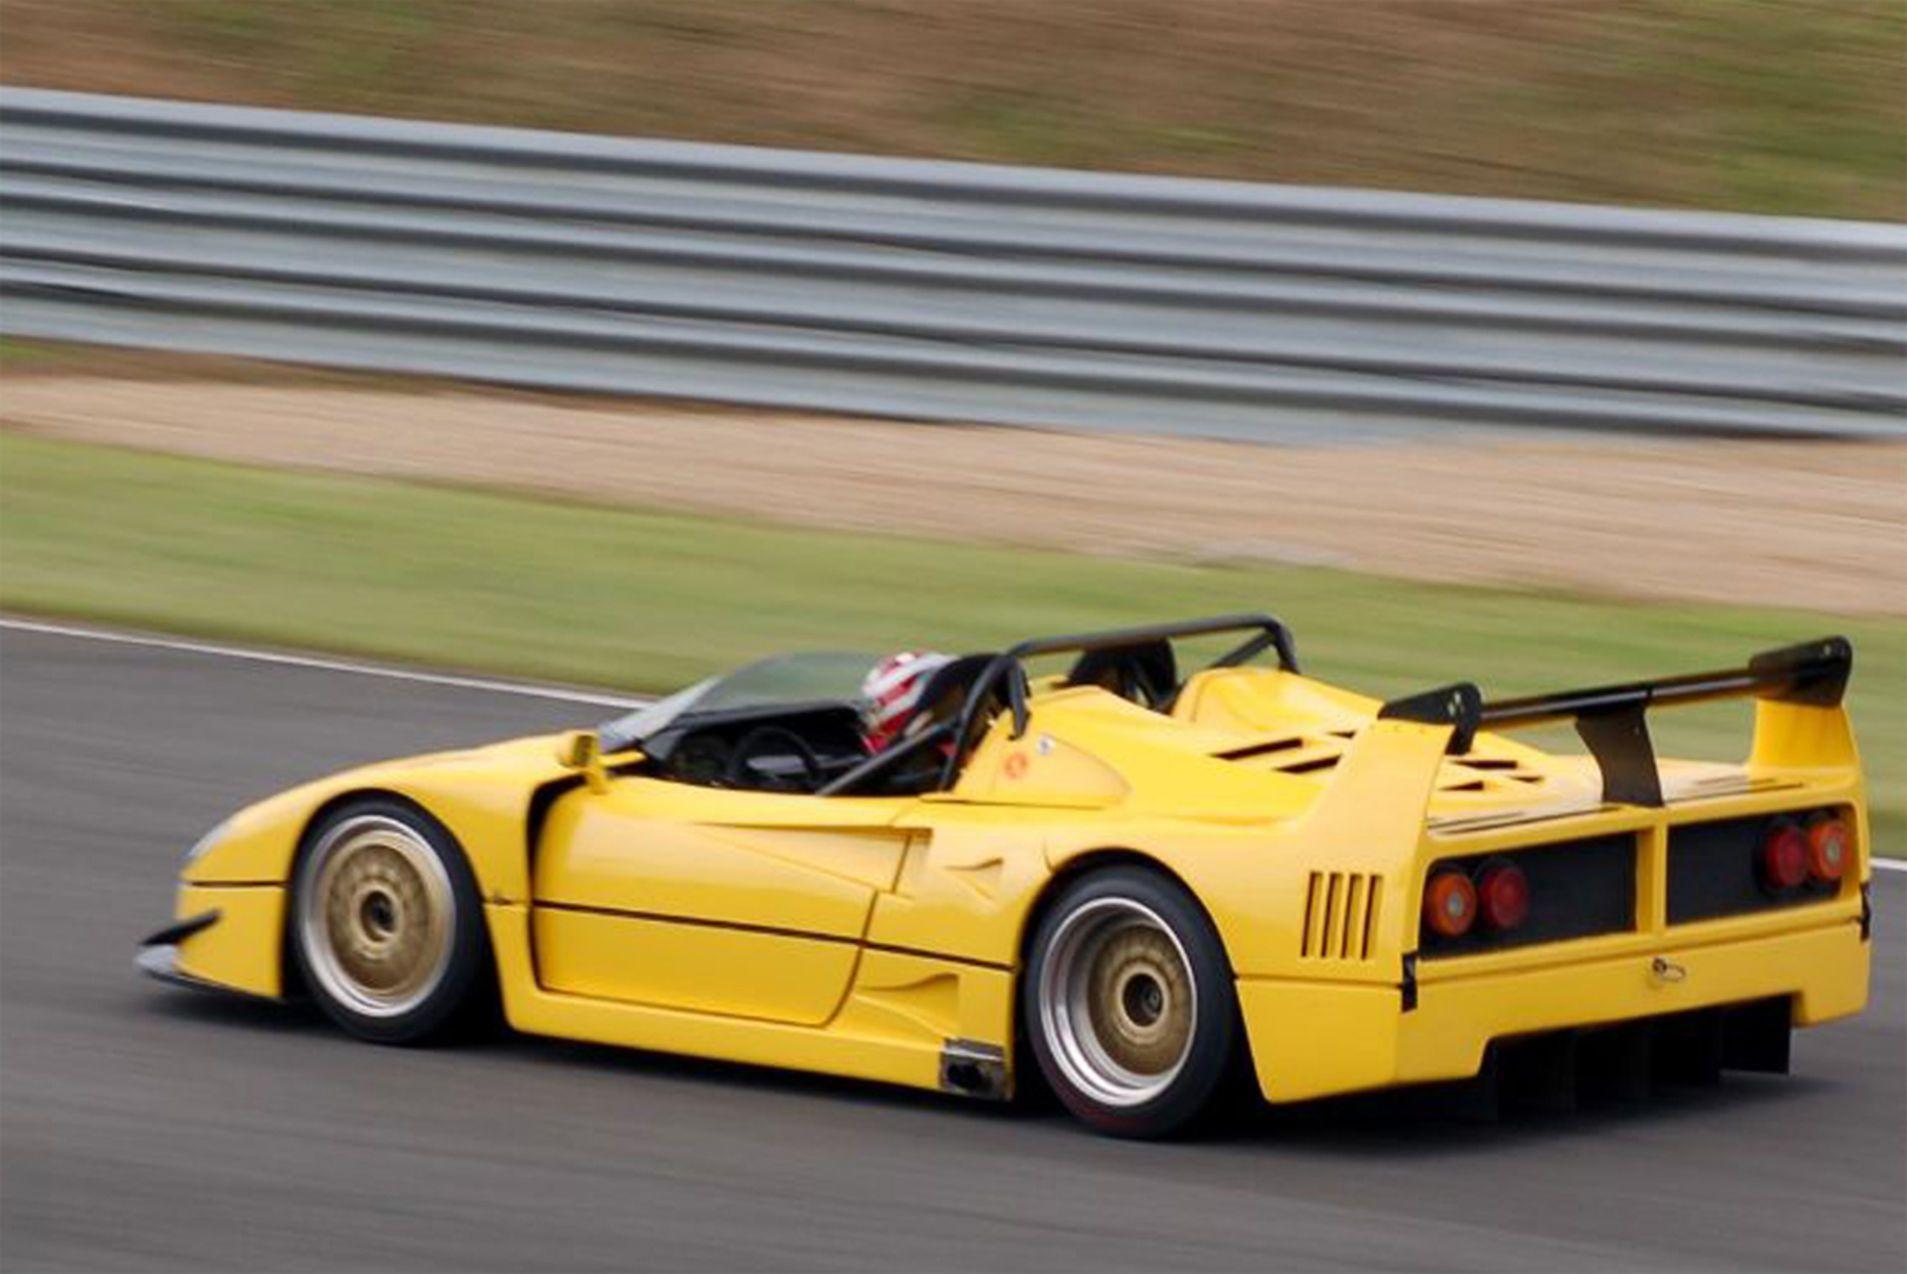 The Story Of The Ferrari F40 Lm That Lost Its Top Ferrari F40